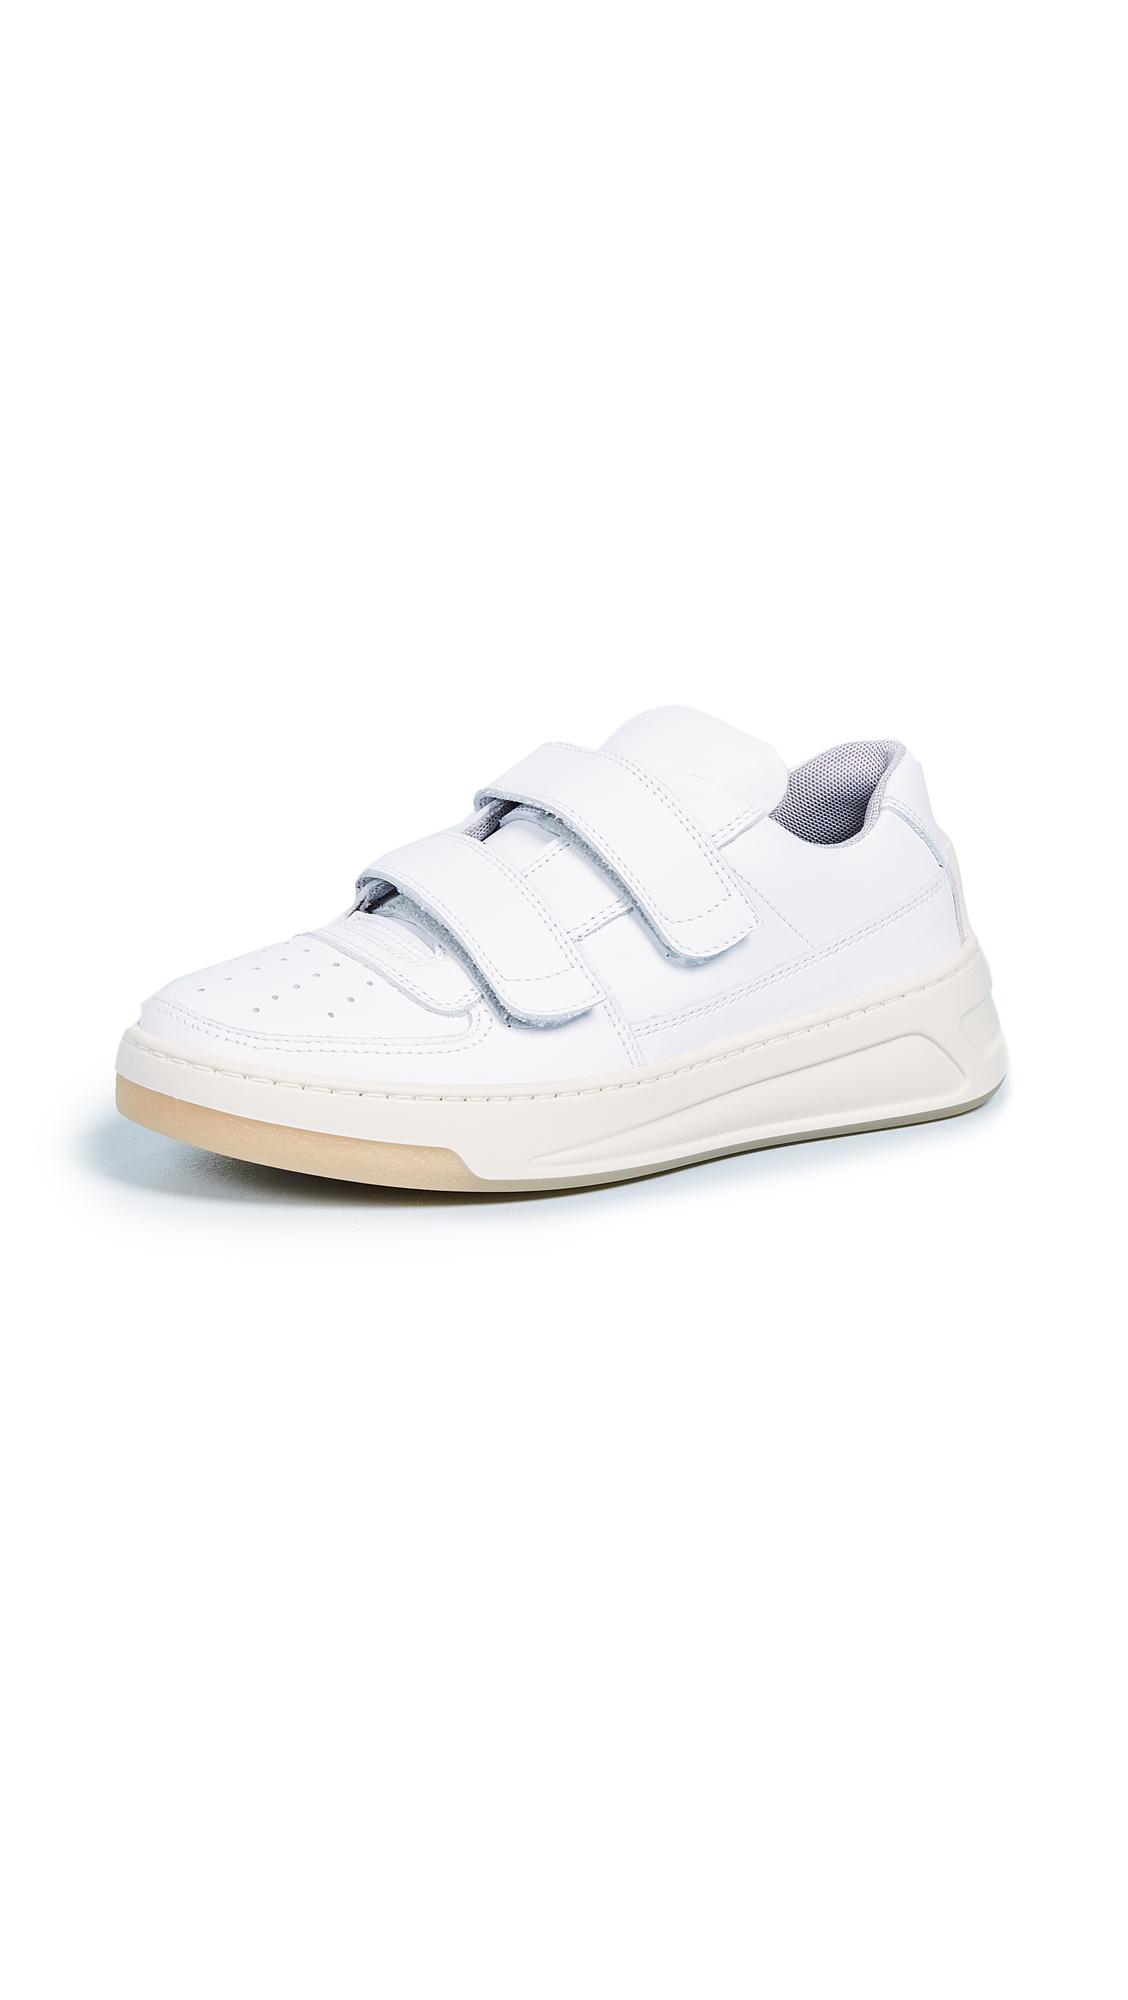 Buy Acne Studios Steffey Sneakers online, shop Acne Studios